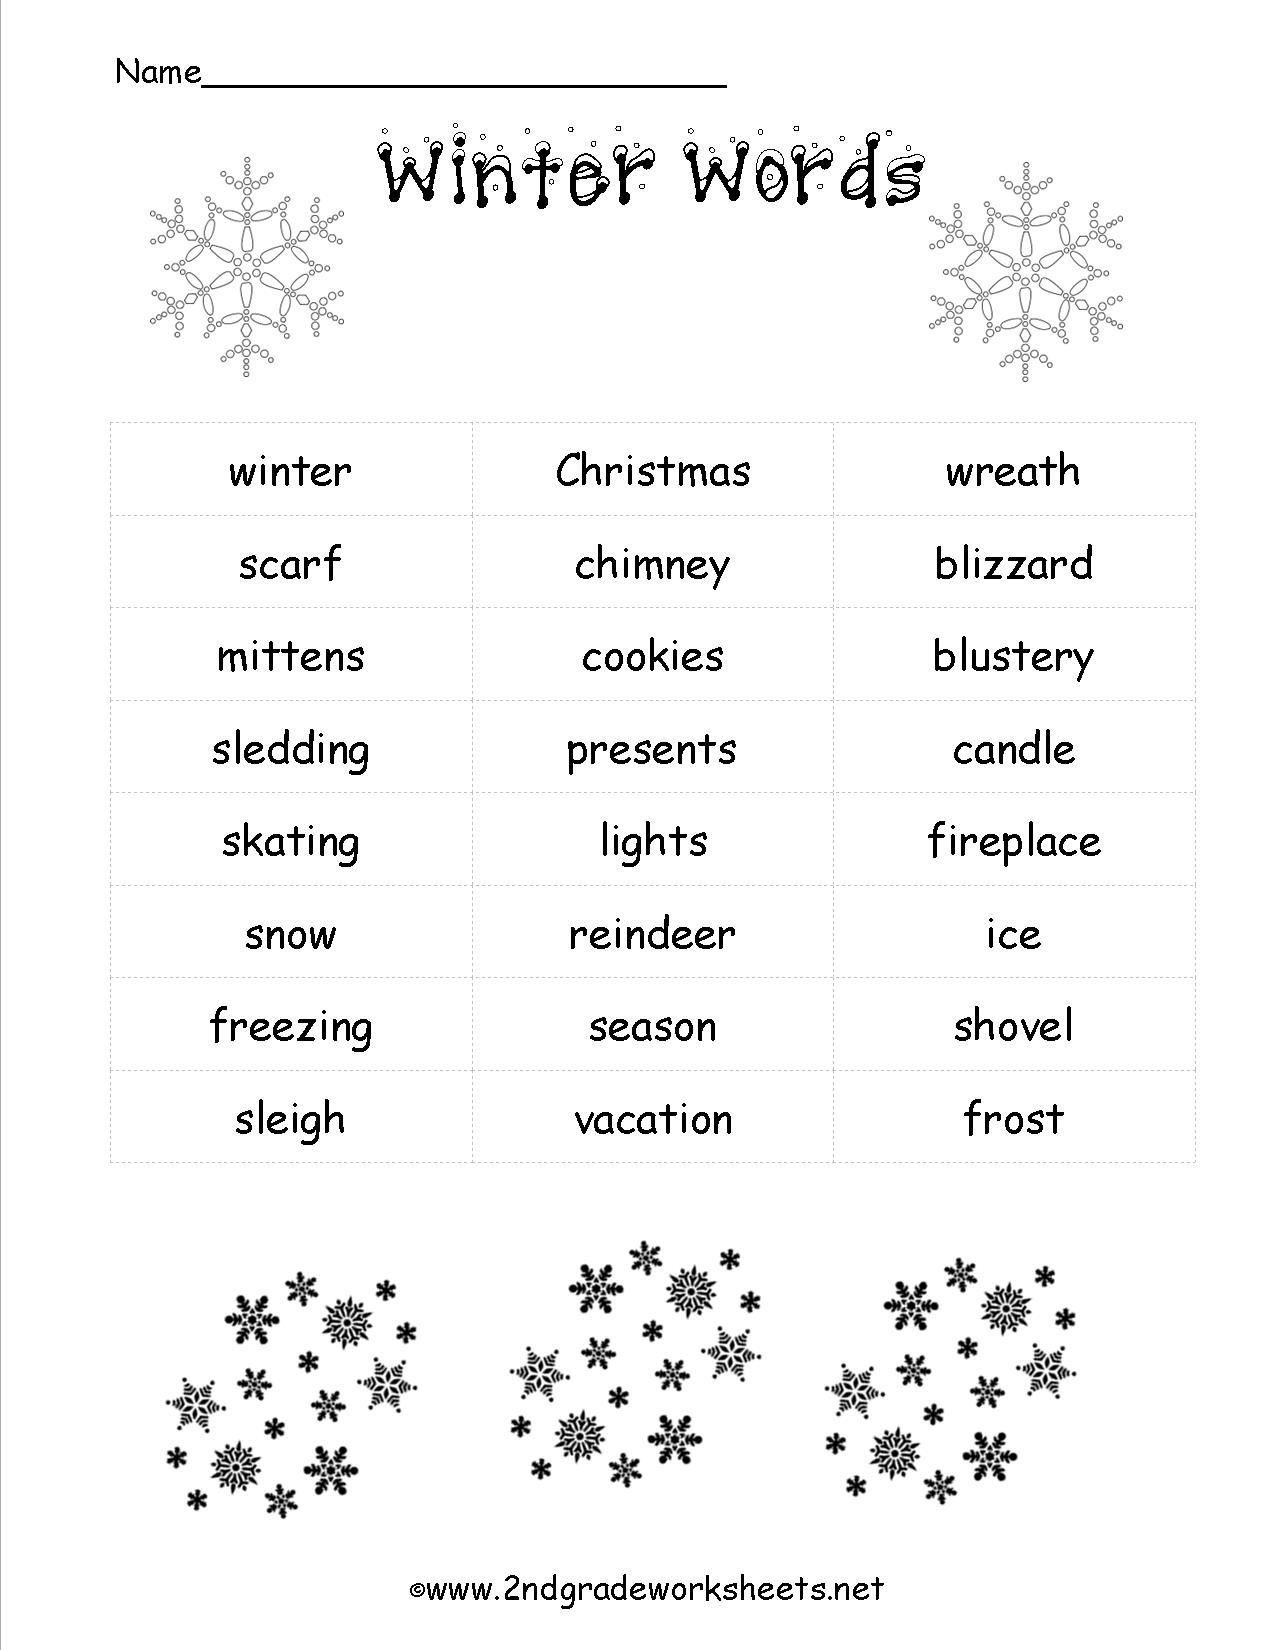 Free Printable Christmas Worksheets For Kids